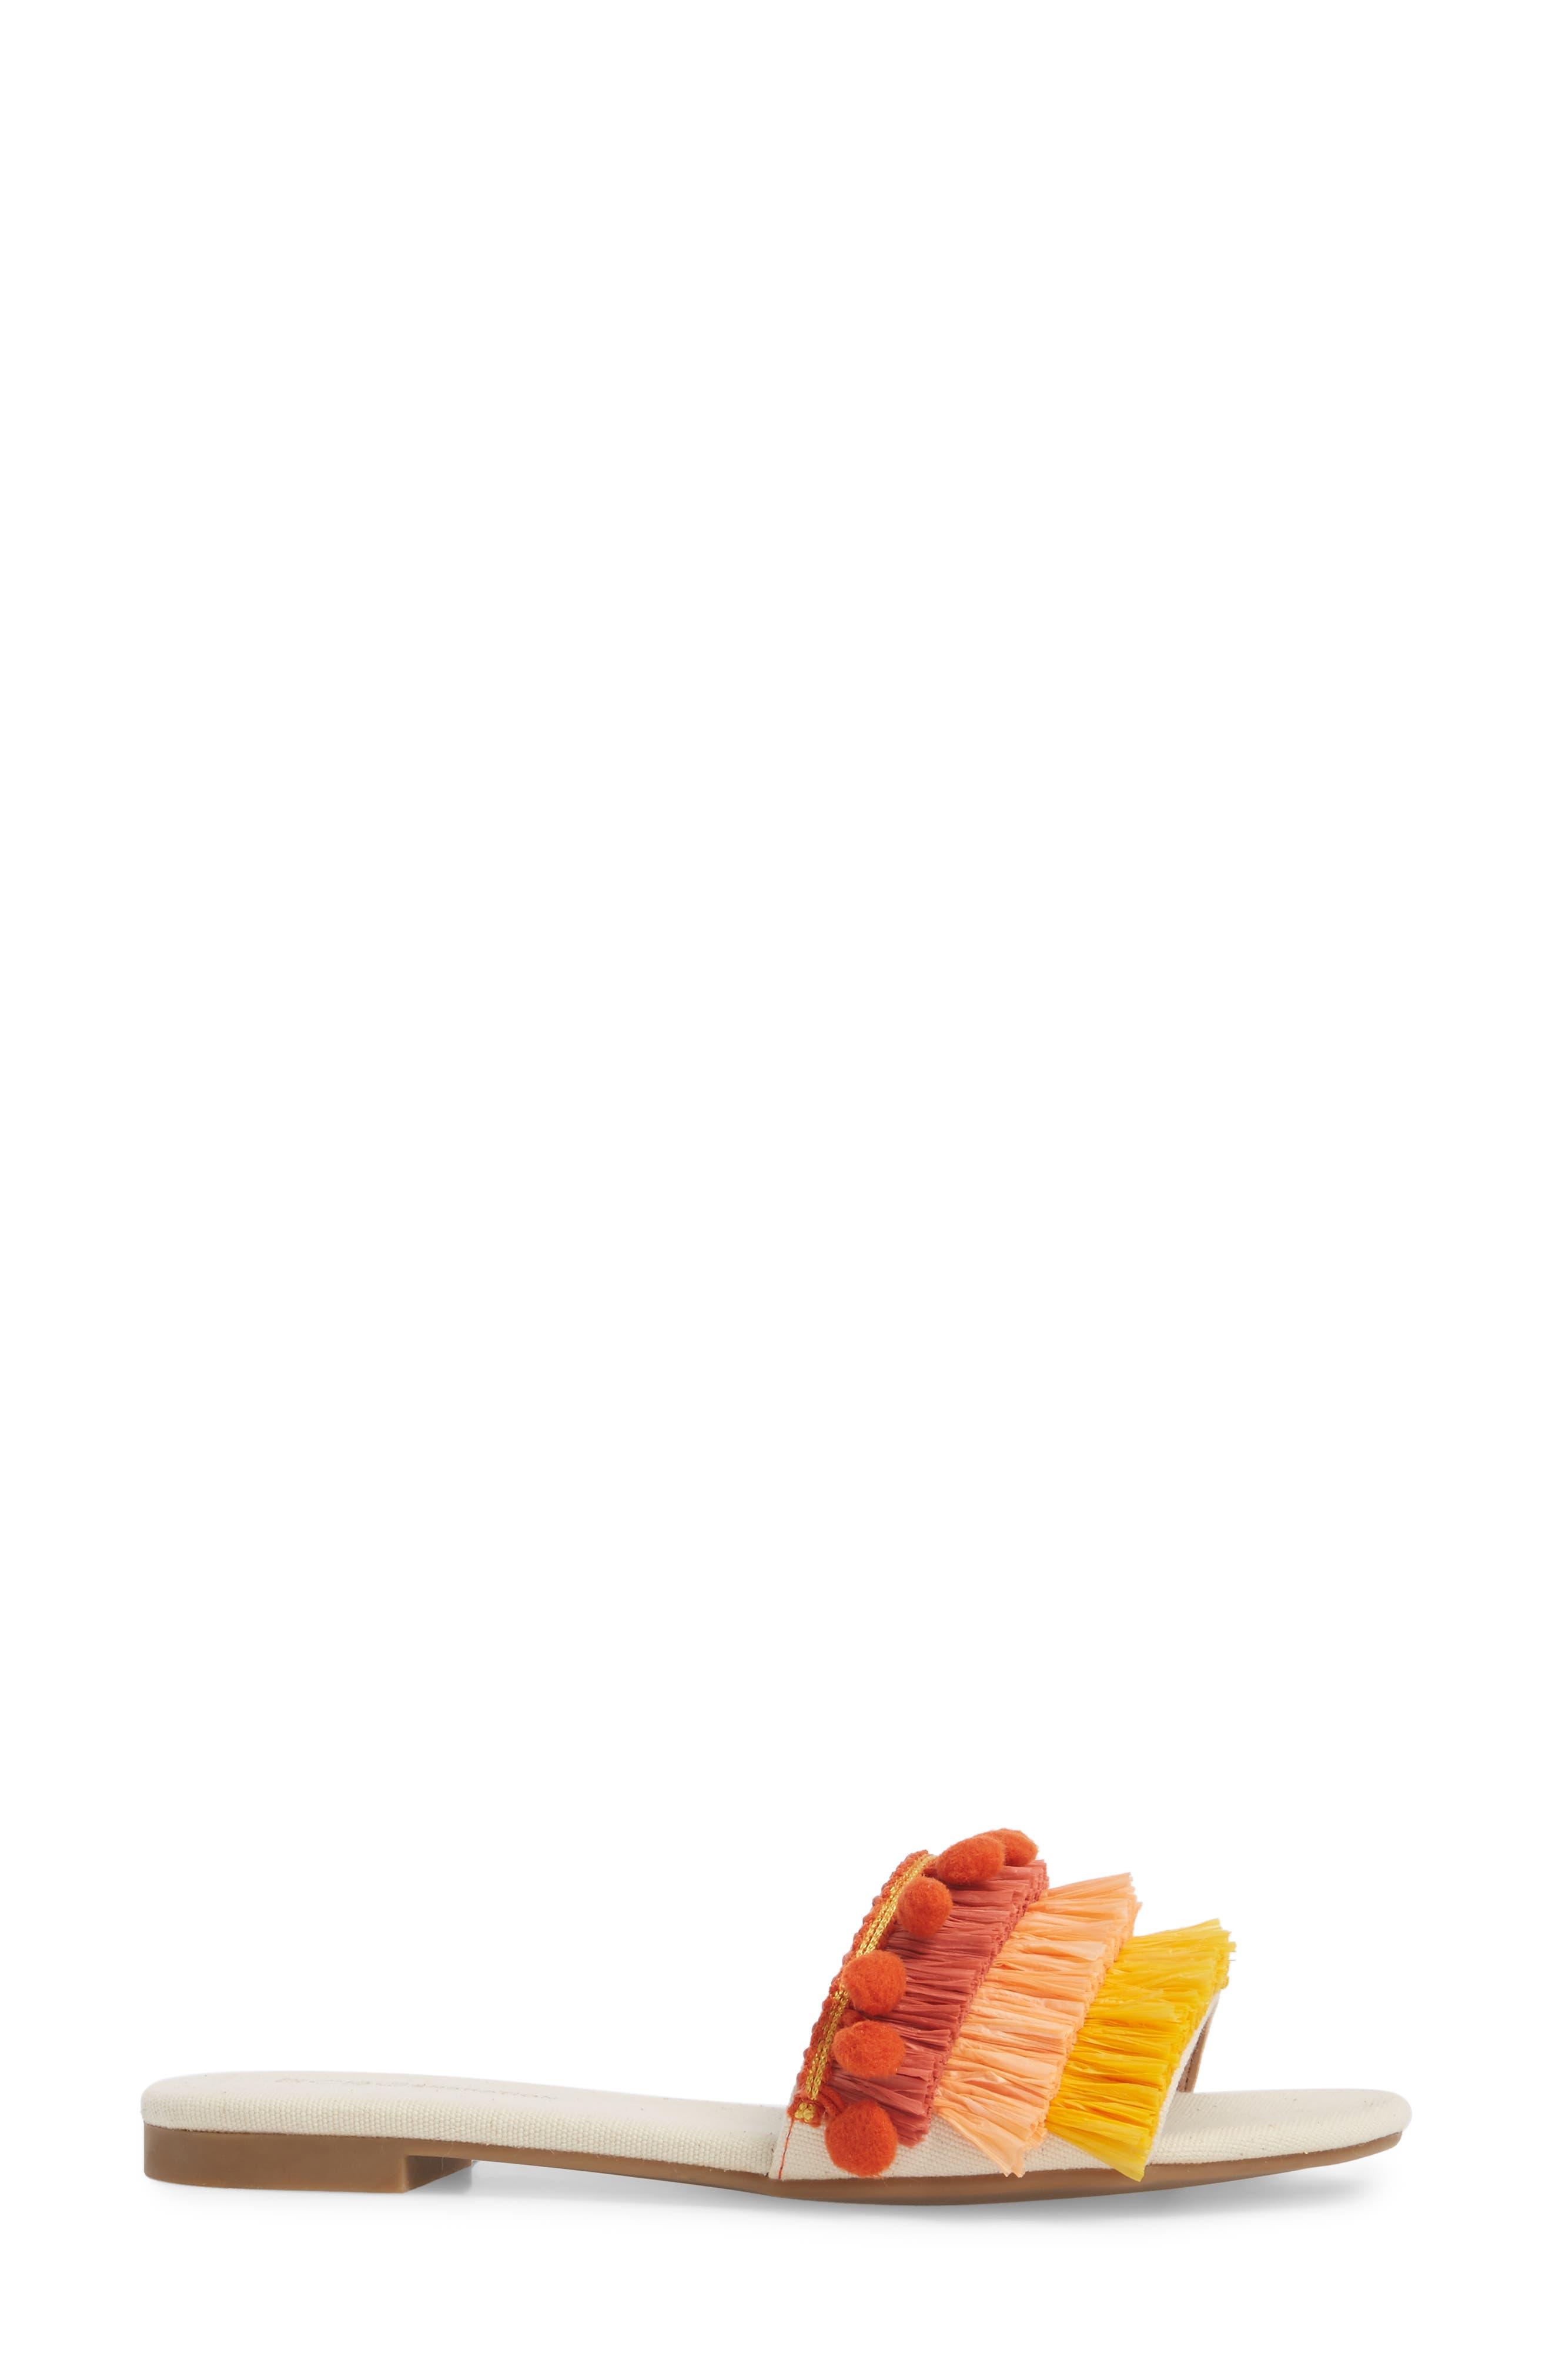 Genna Raffia Tier Slide Sandal,                             Alternate thumbnail 3, color,                             750